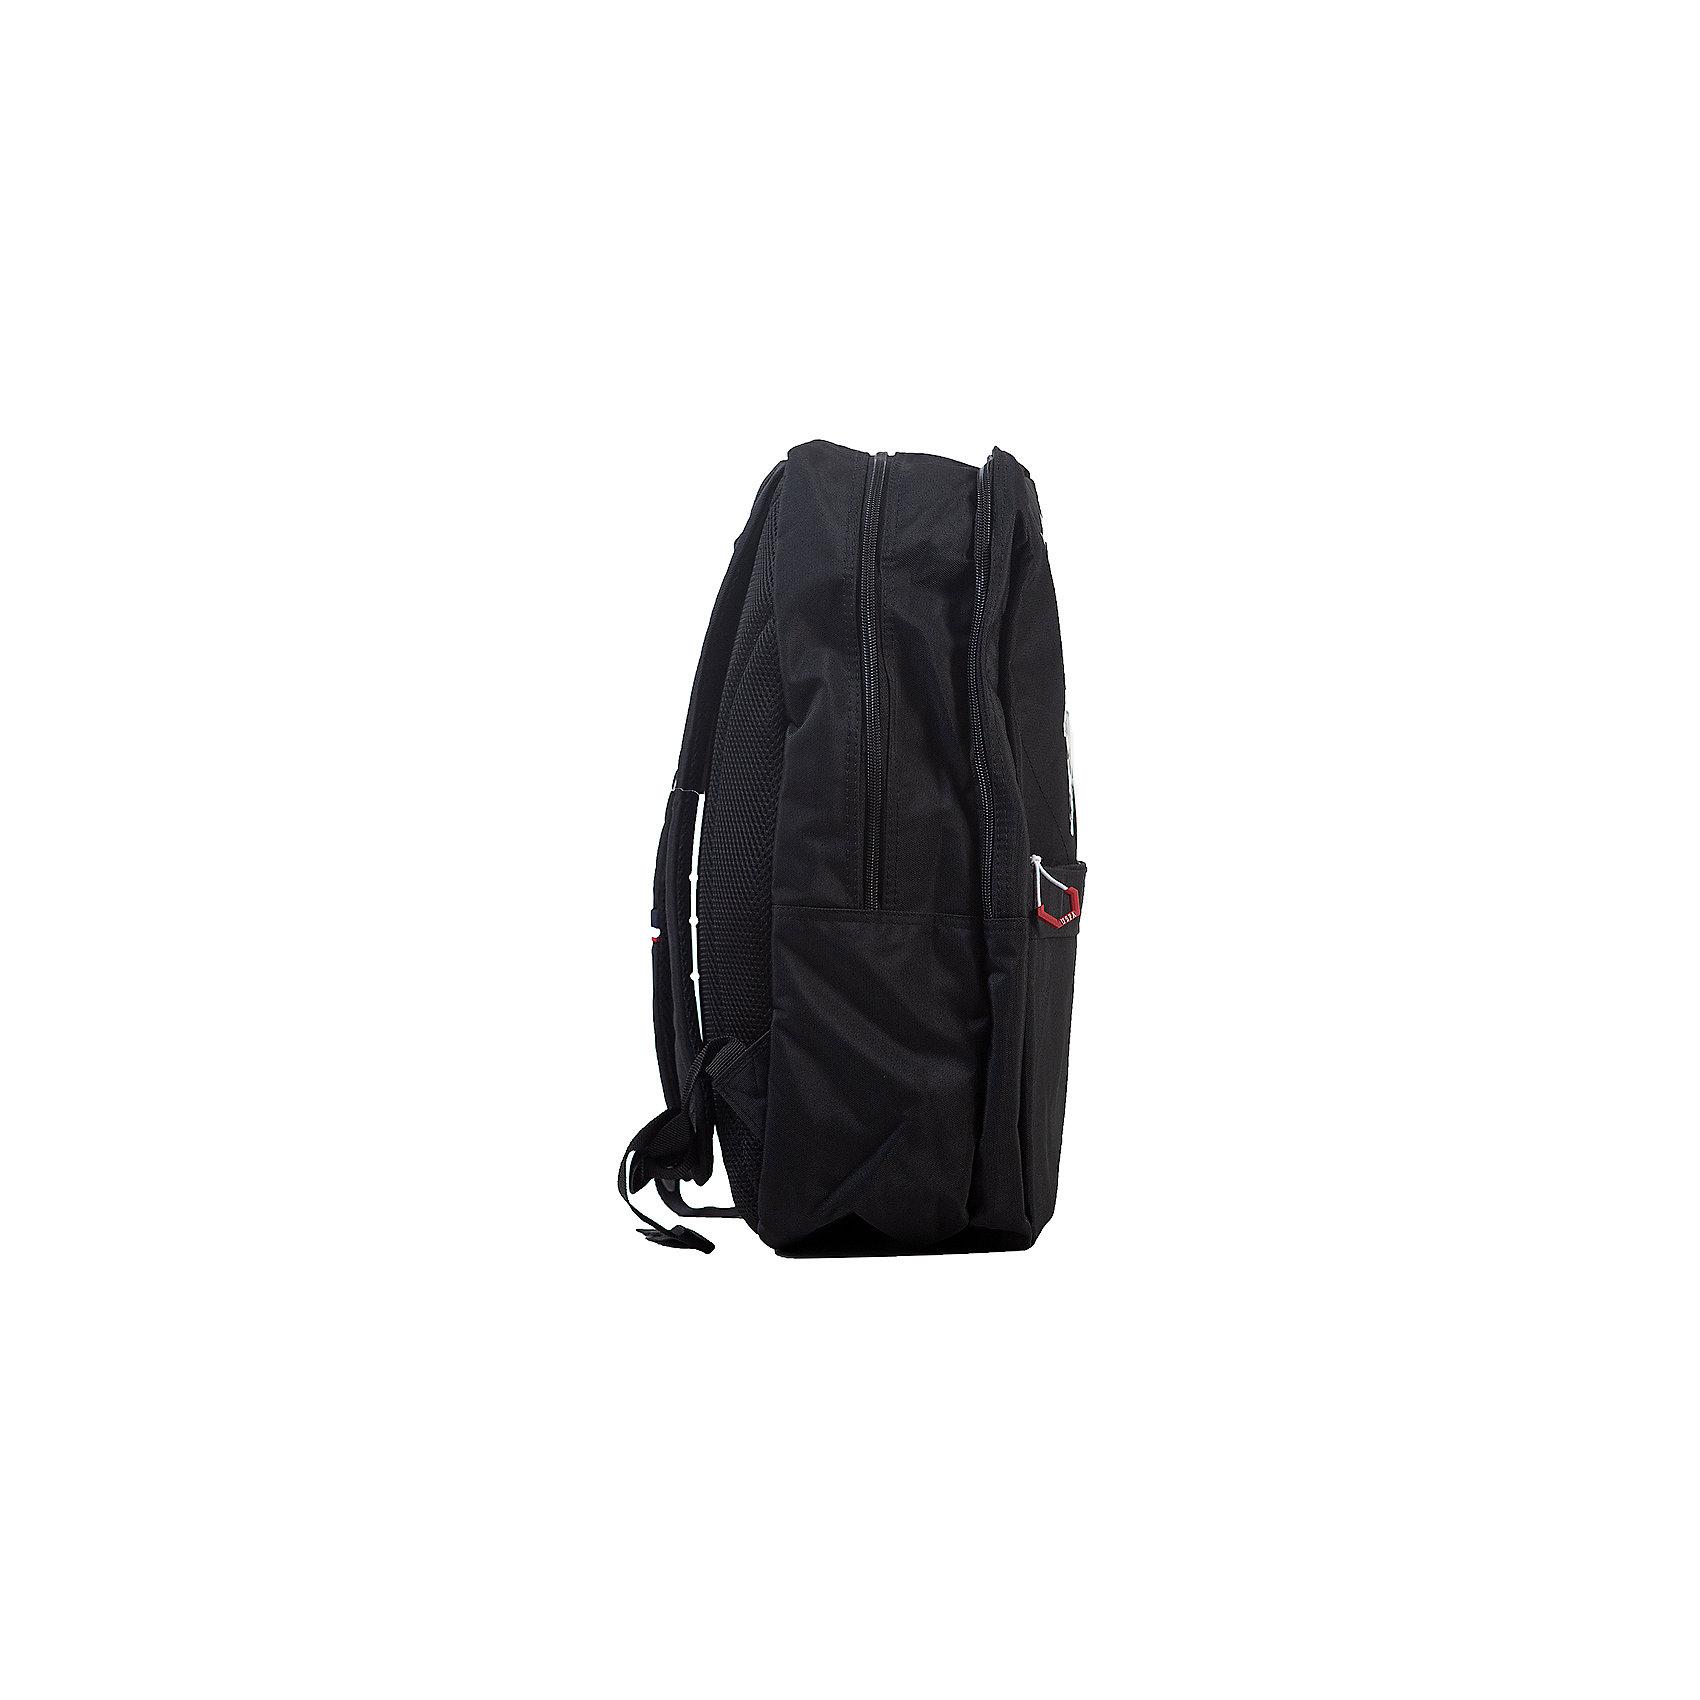 Рюкзак U.S. Polo Assn, 32х16х46 см по цене 3 799